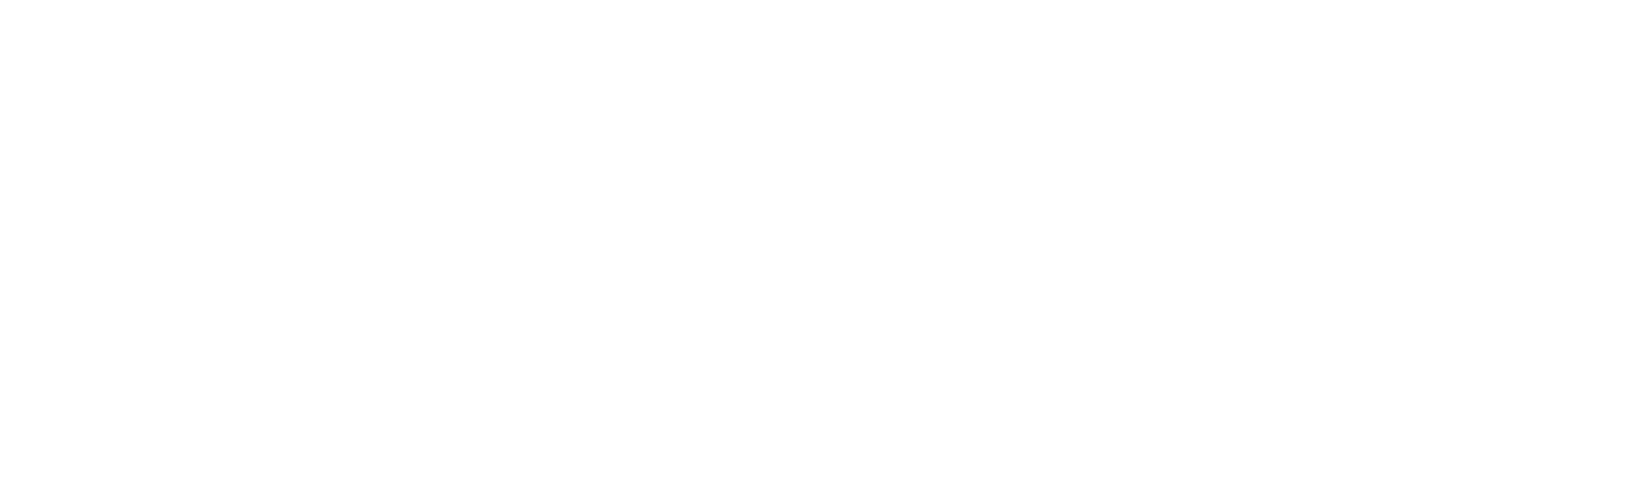 title_02_borobudur